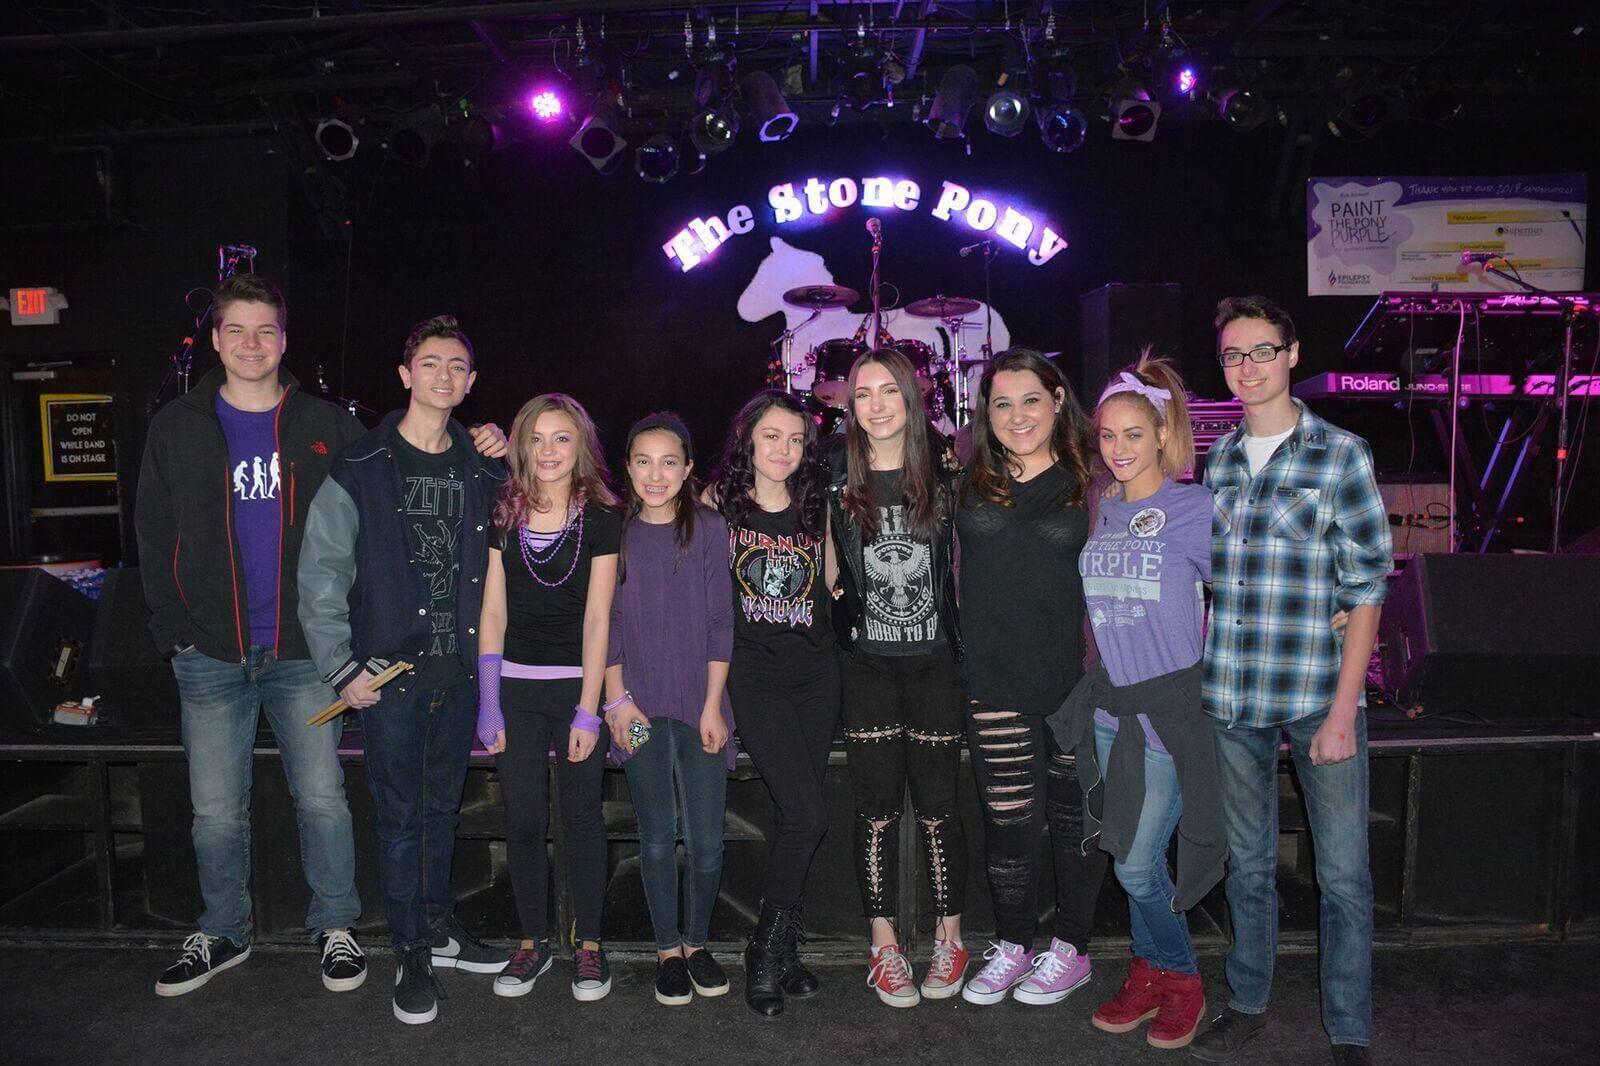 Marlboro School of Rock Future All Star Band at The Stone Pony